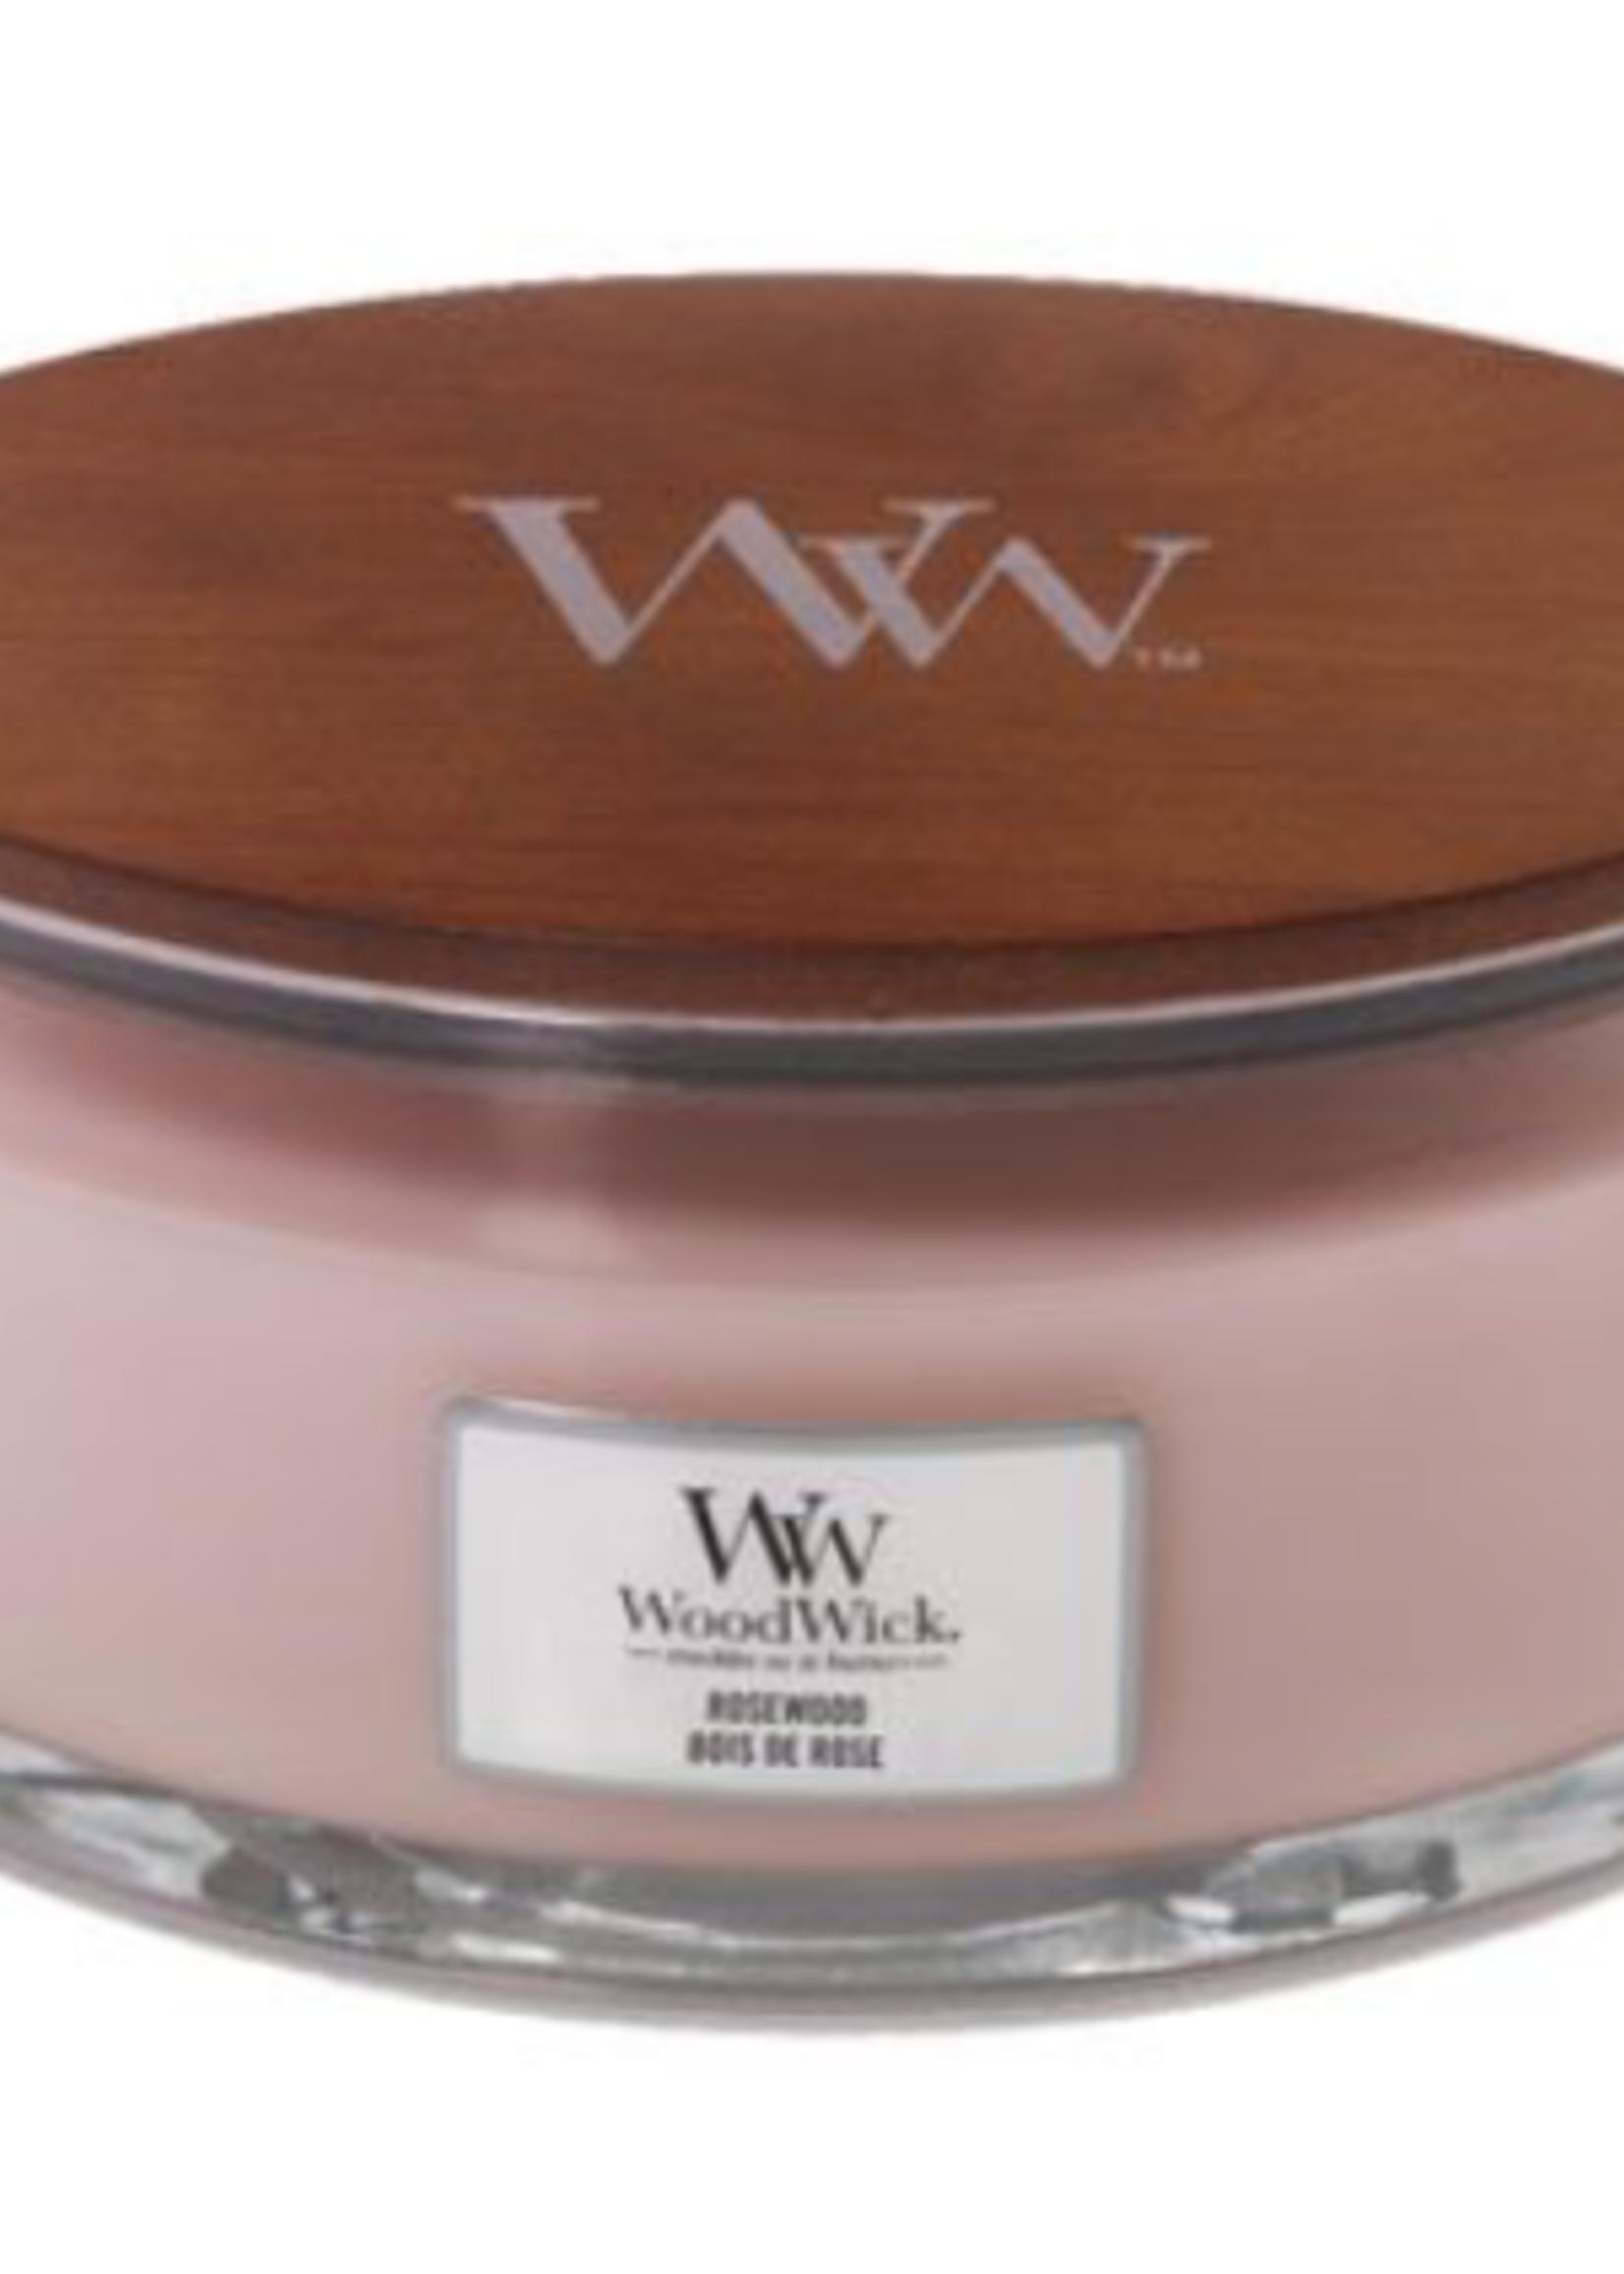 Woodwick Woodwick Rosewood Ellipse Candle